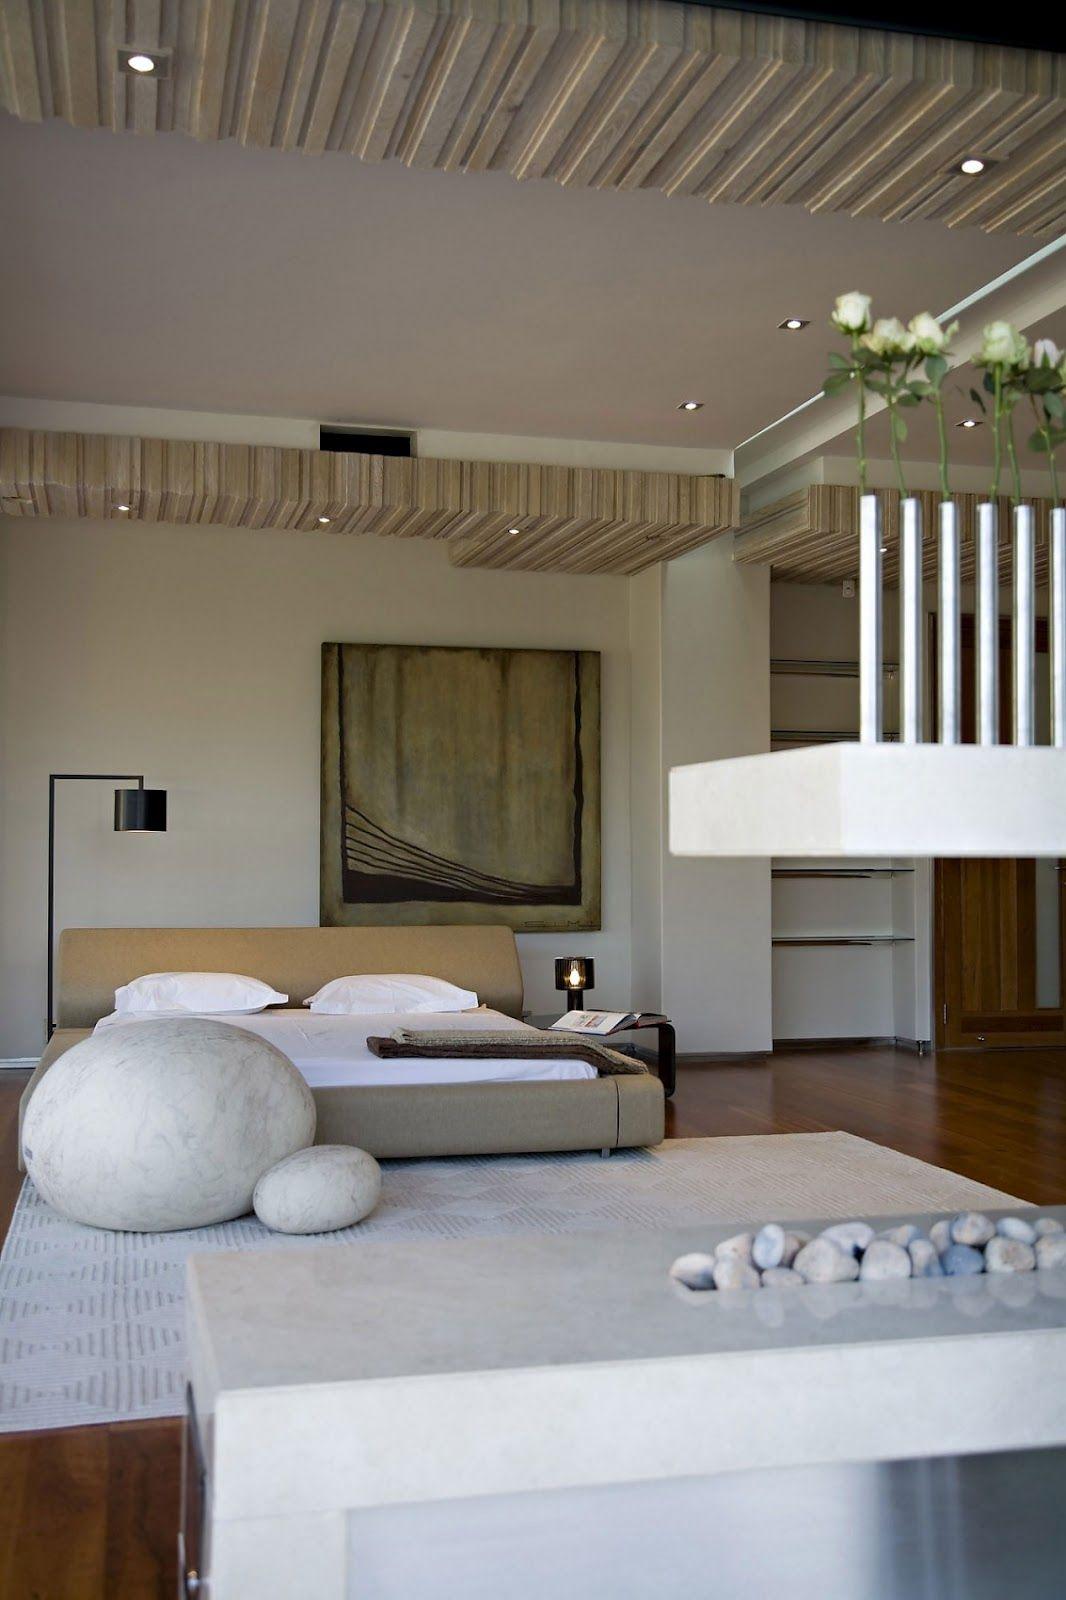 4 room master bedroom design  Modern Bedroom Design  Interior Design  Pinterest  Bedrooms